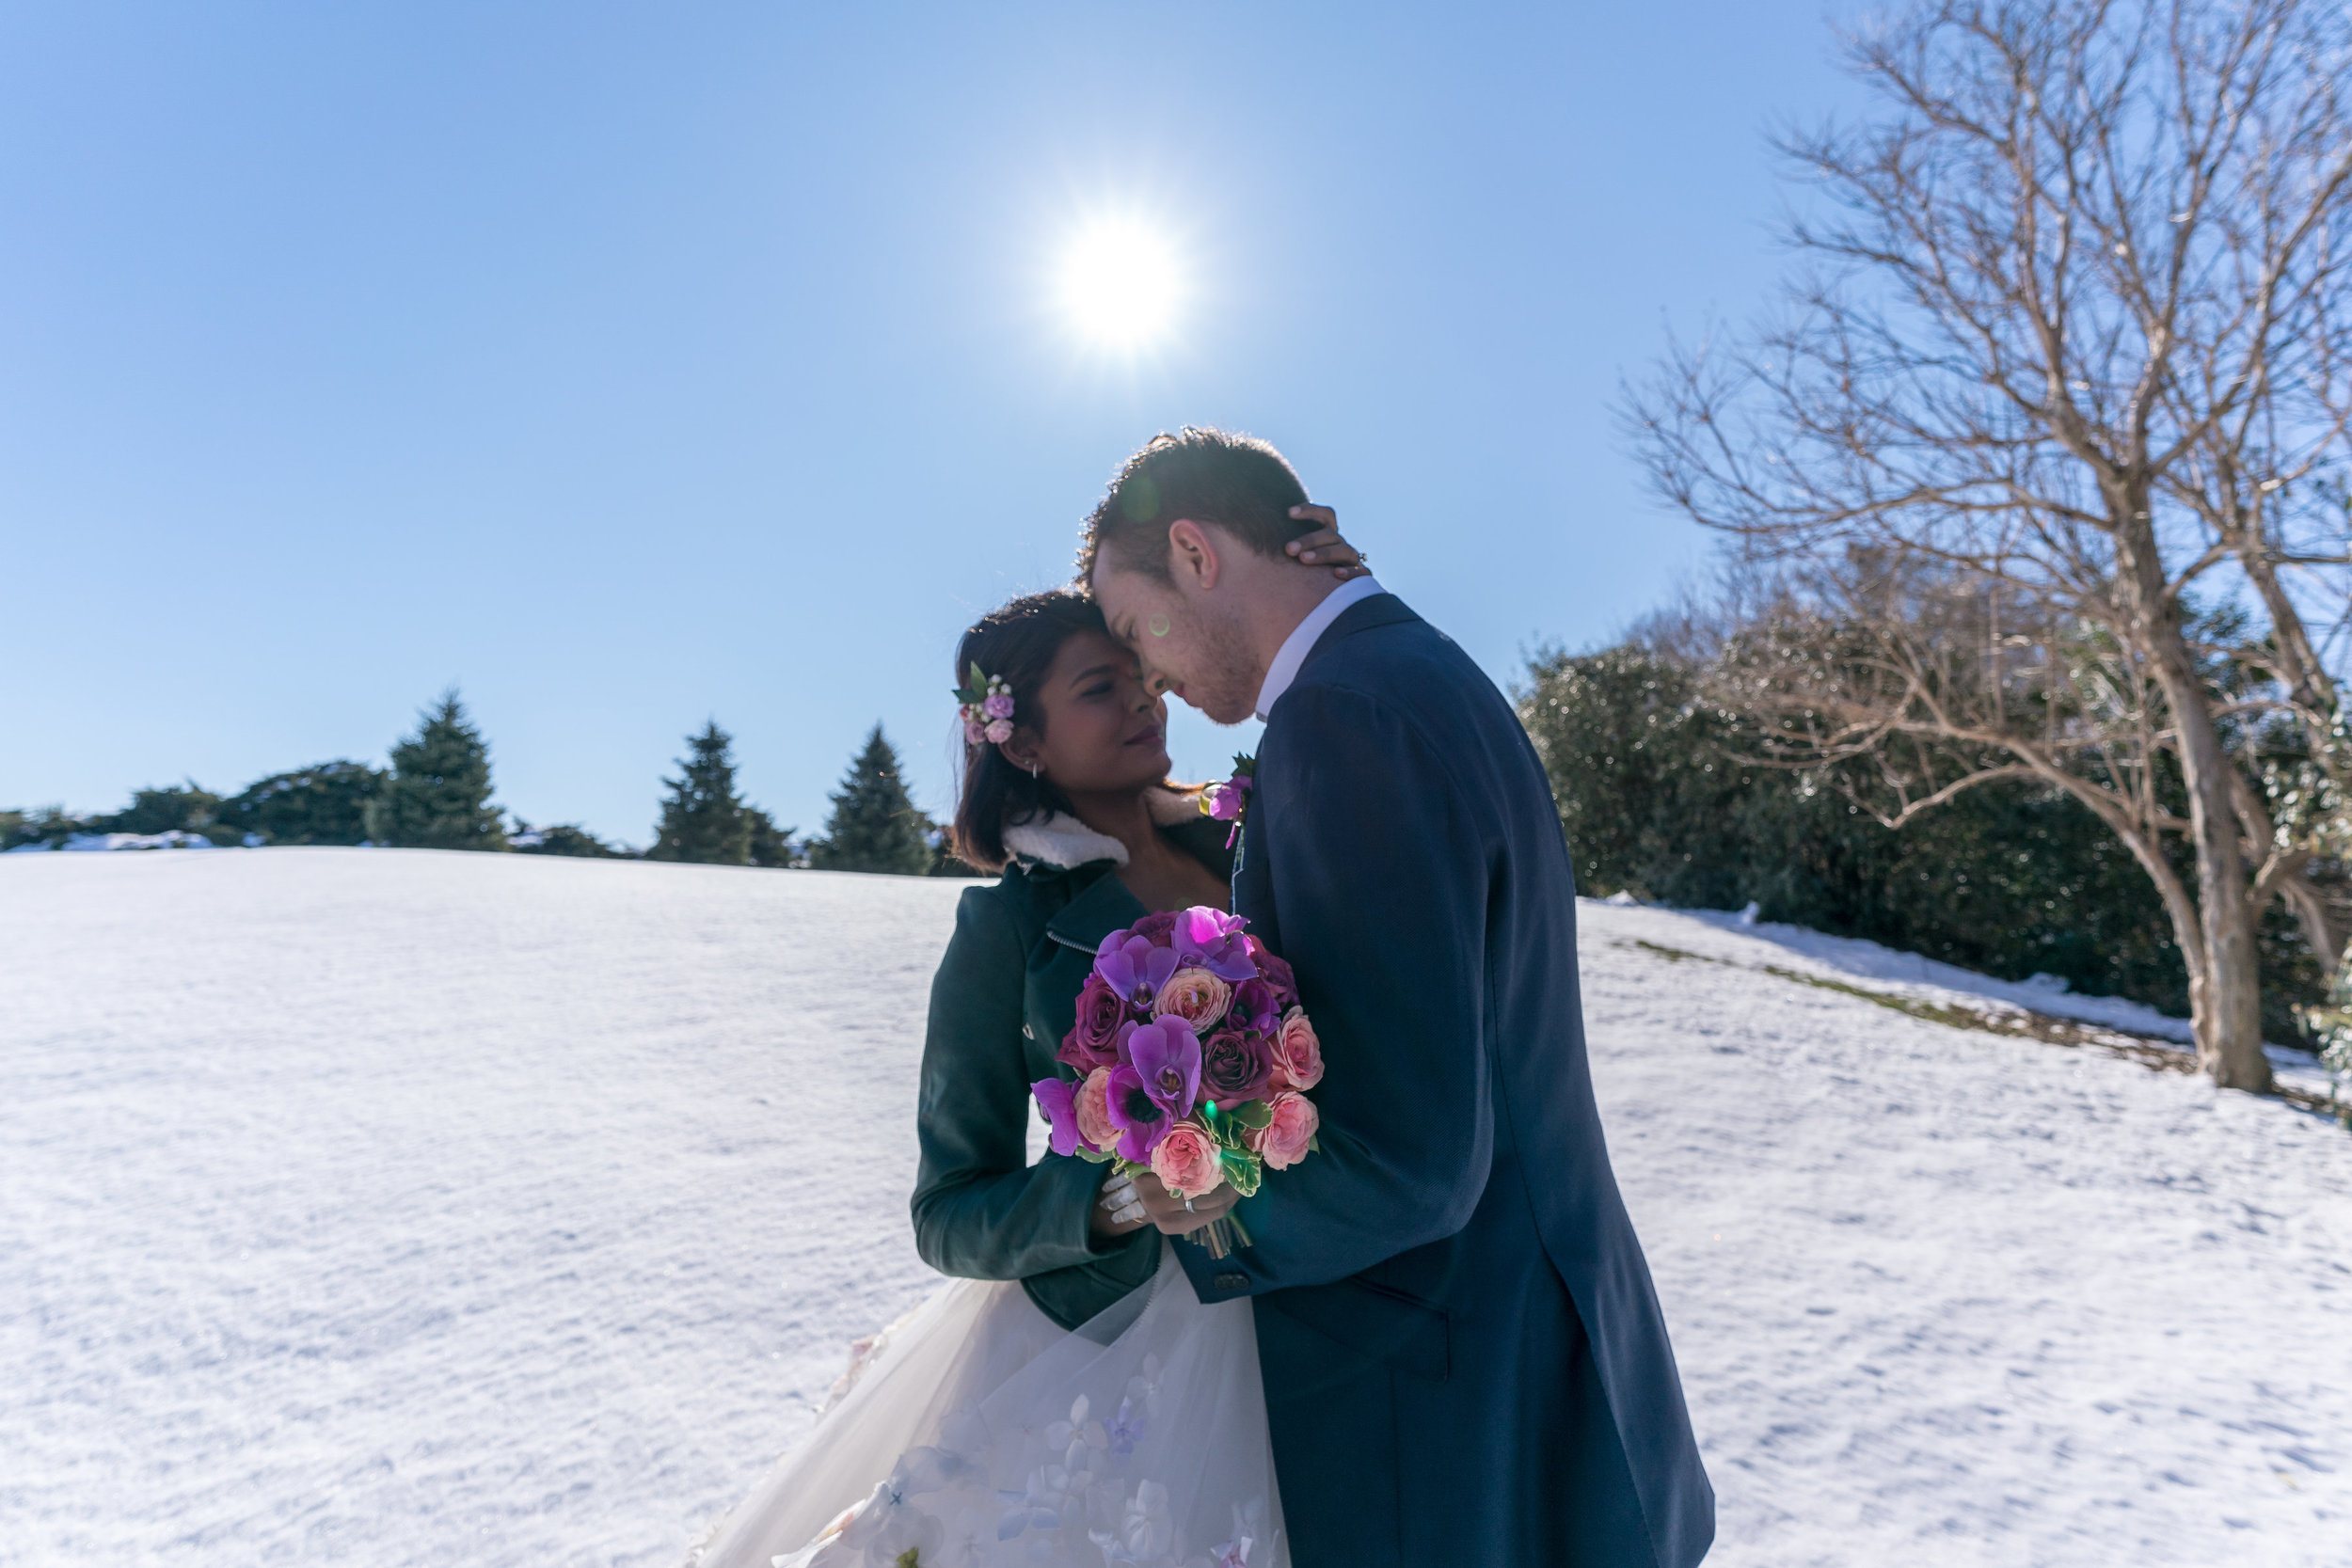 longwood-gardens-winter-wedding-photographer